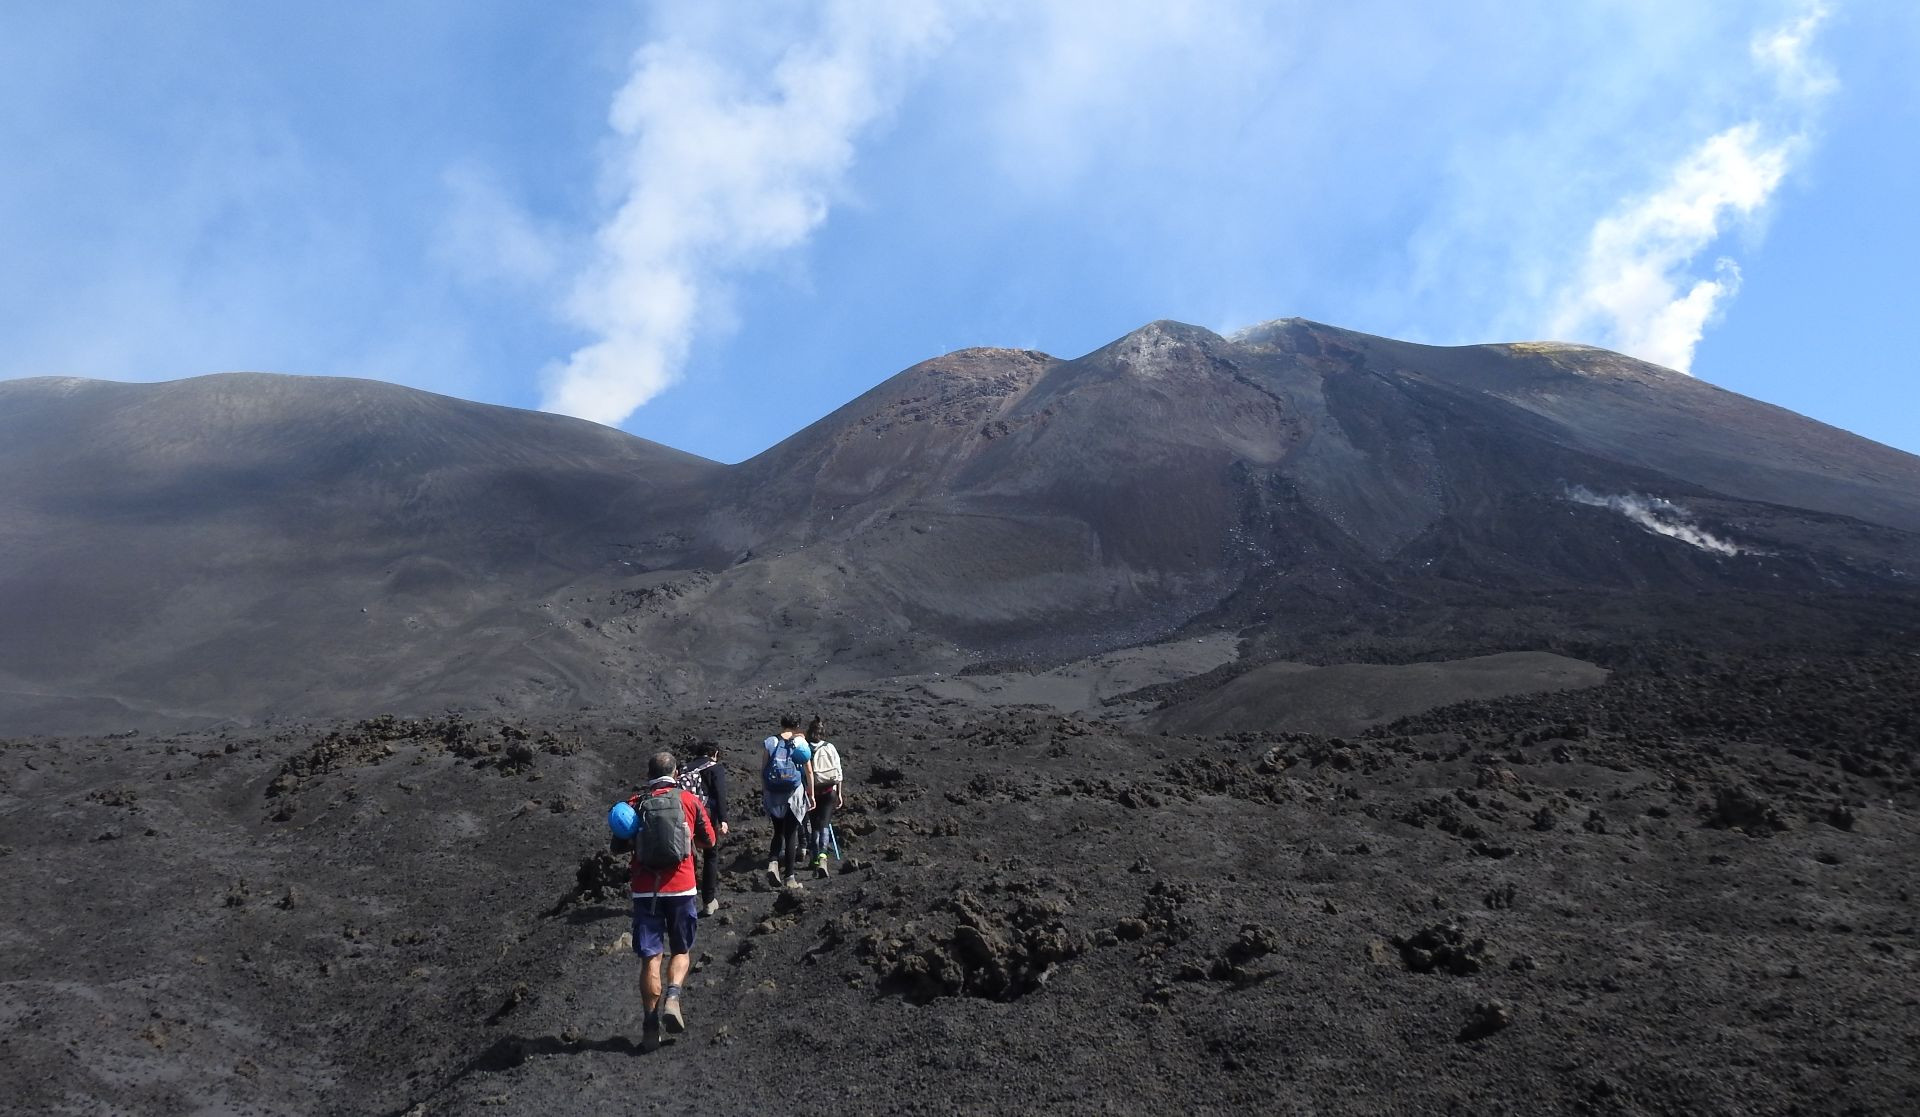 Salita sull'Etna in funivia e trekking tour